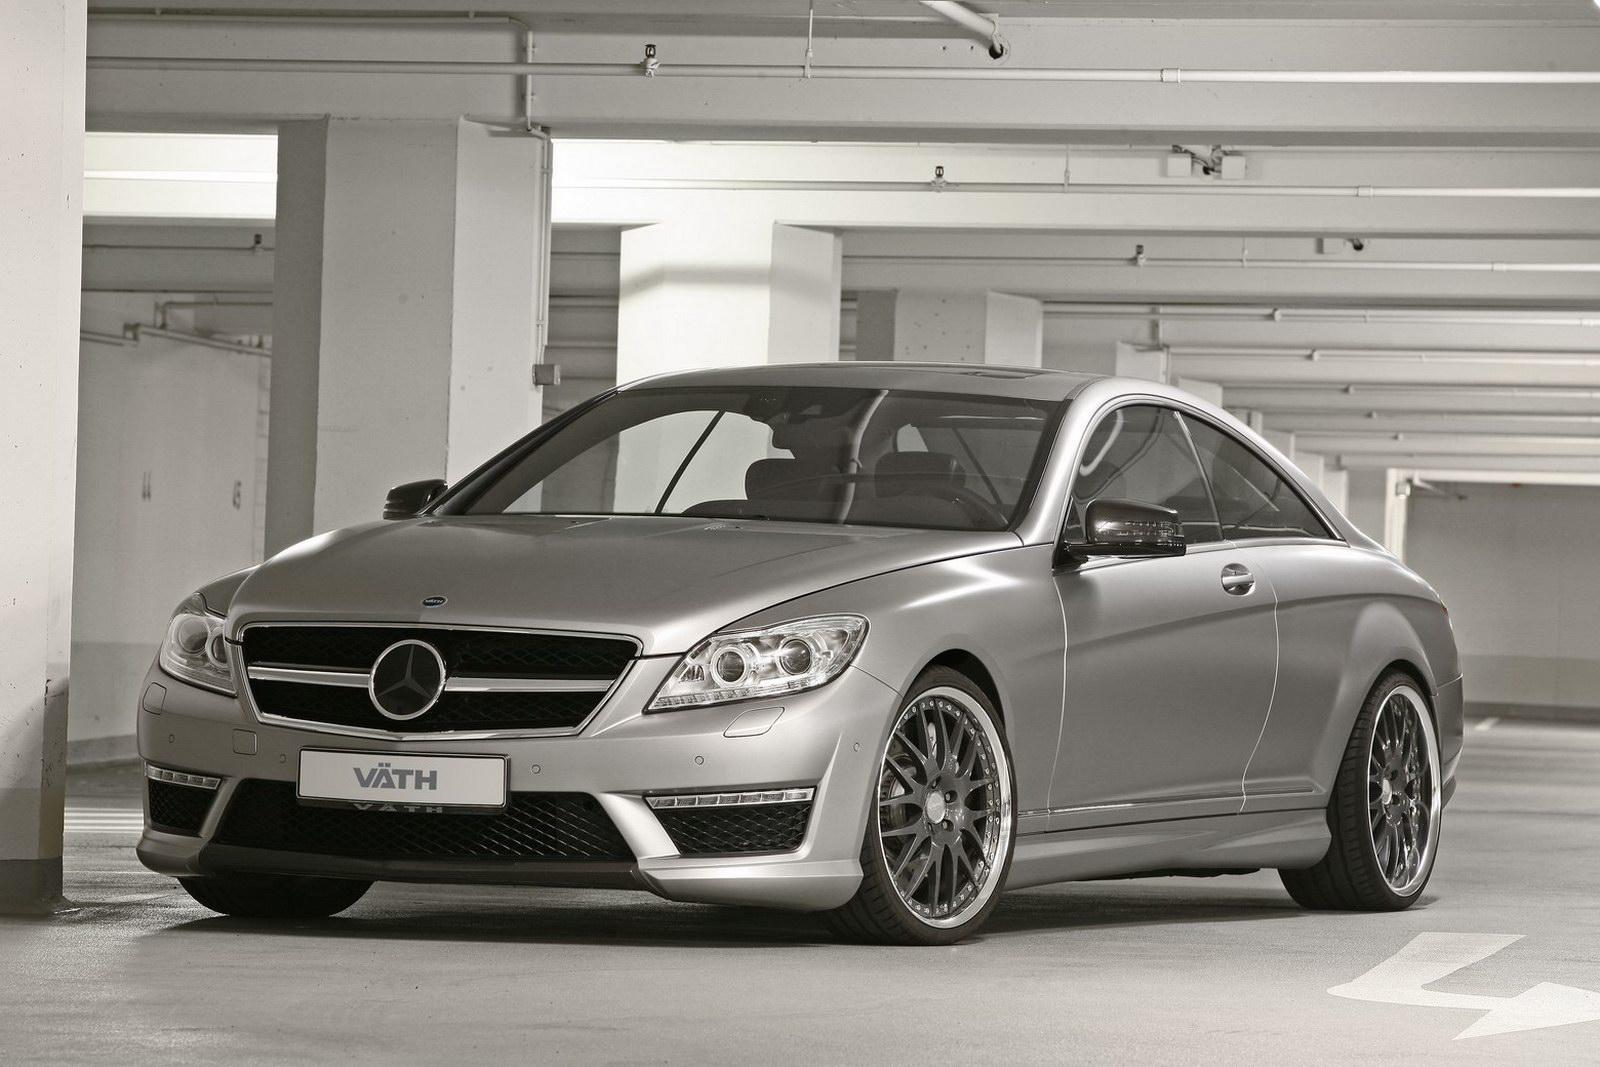 Mercedes-Bent CL 63 AMG a nárust výkonu od Väth 4